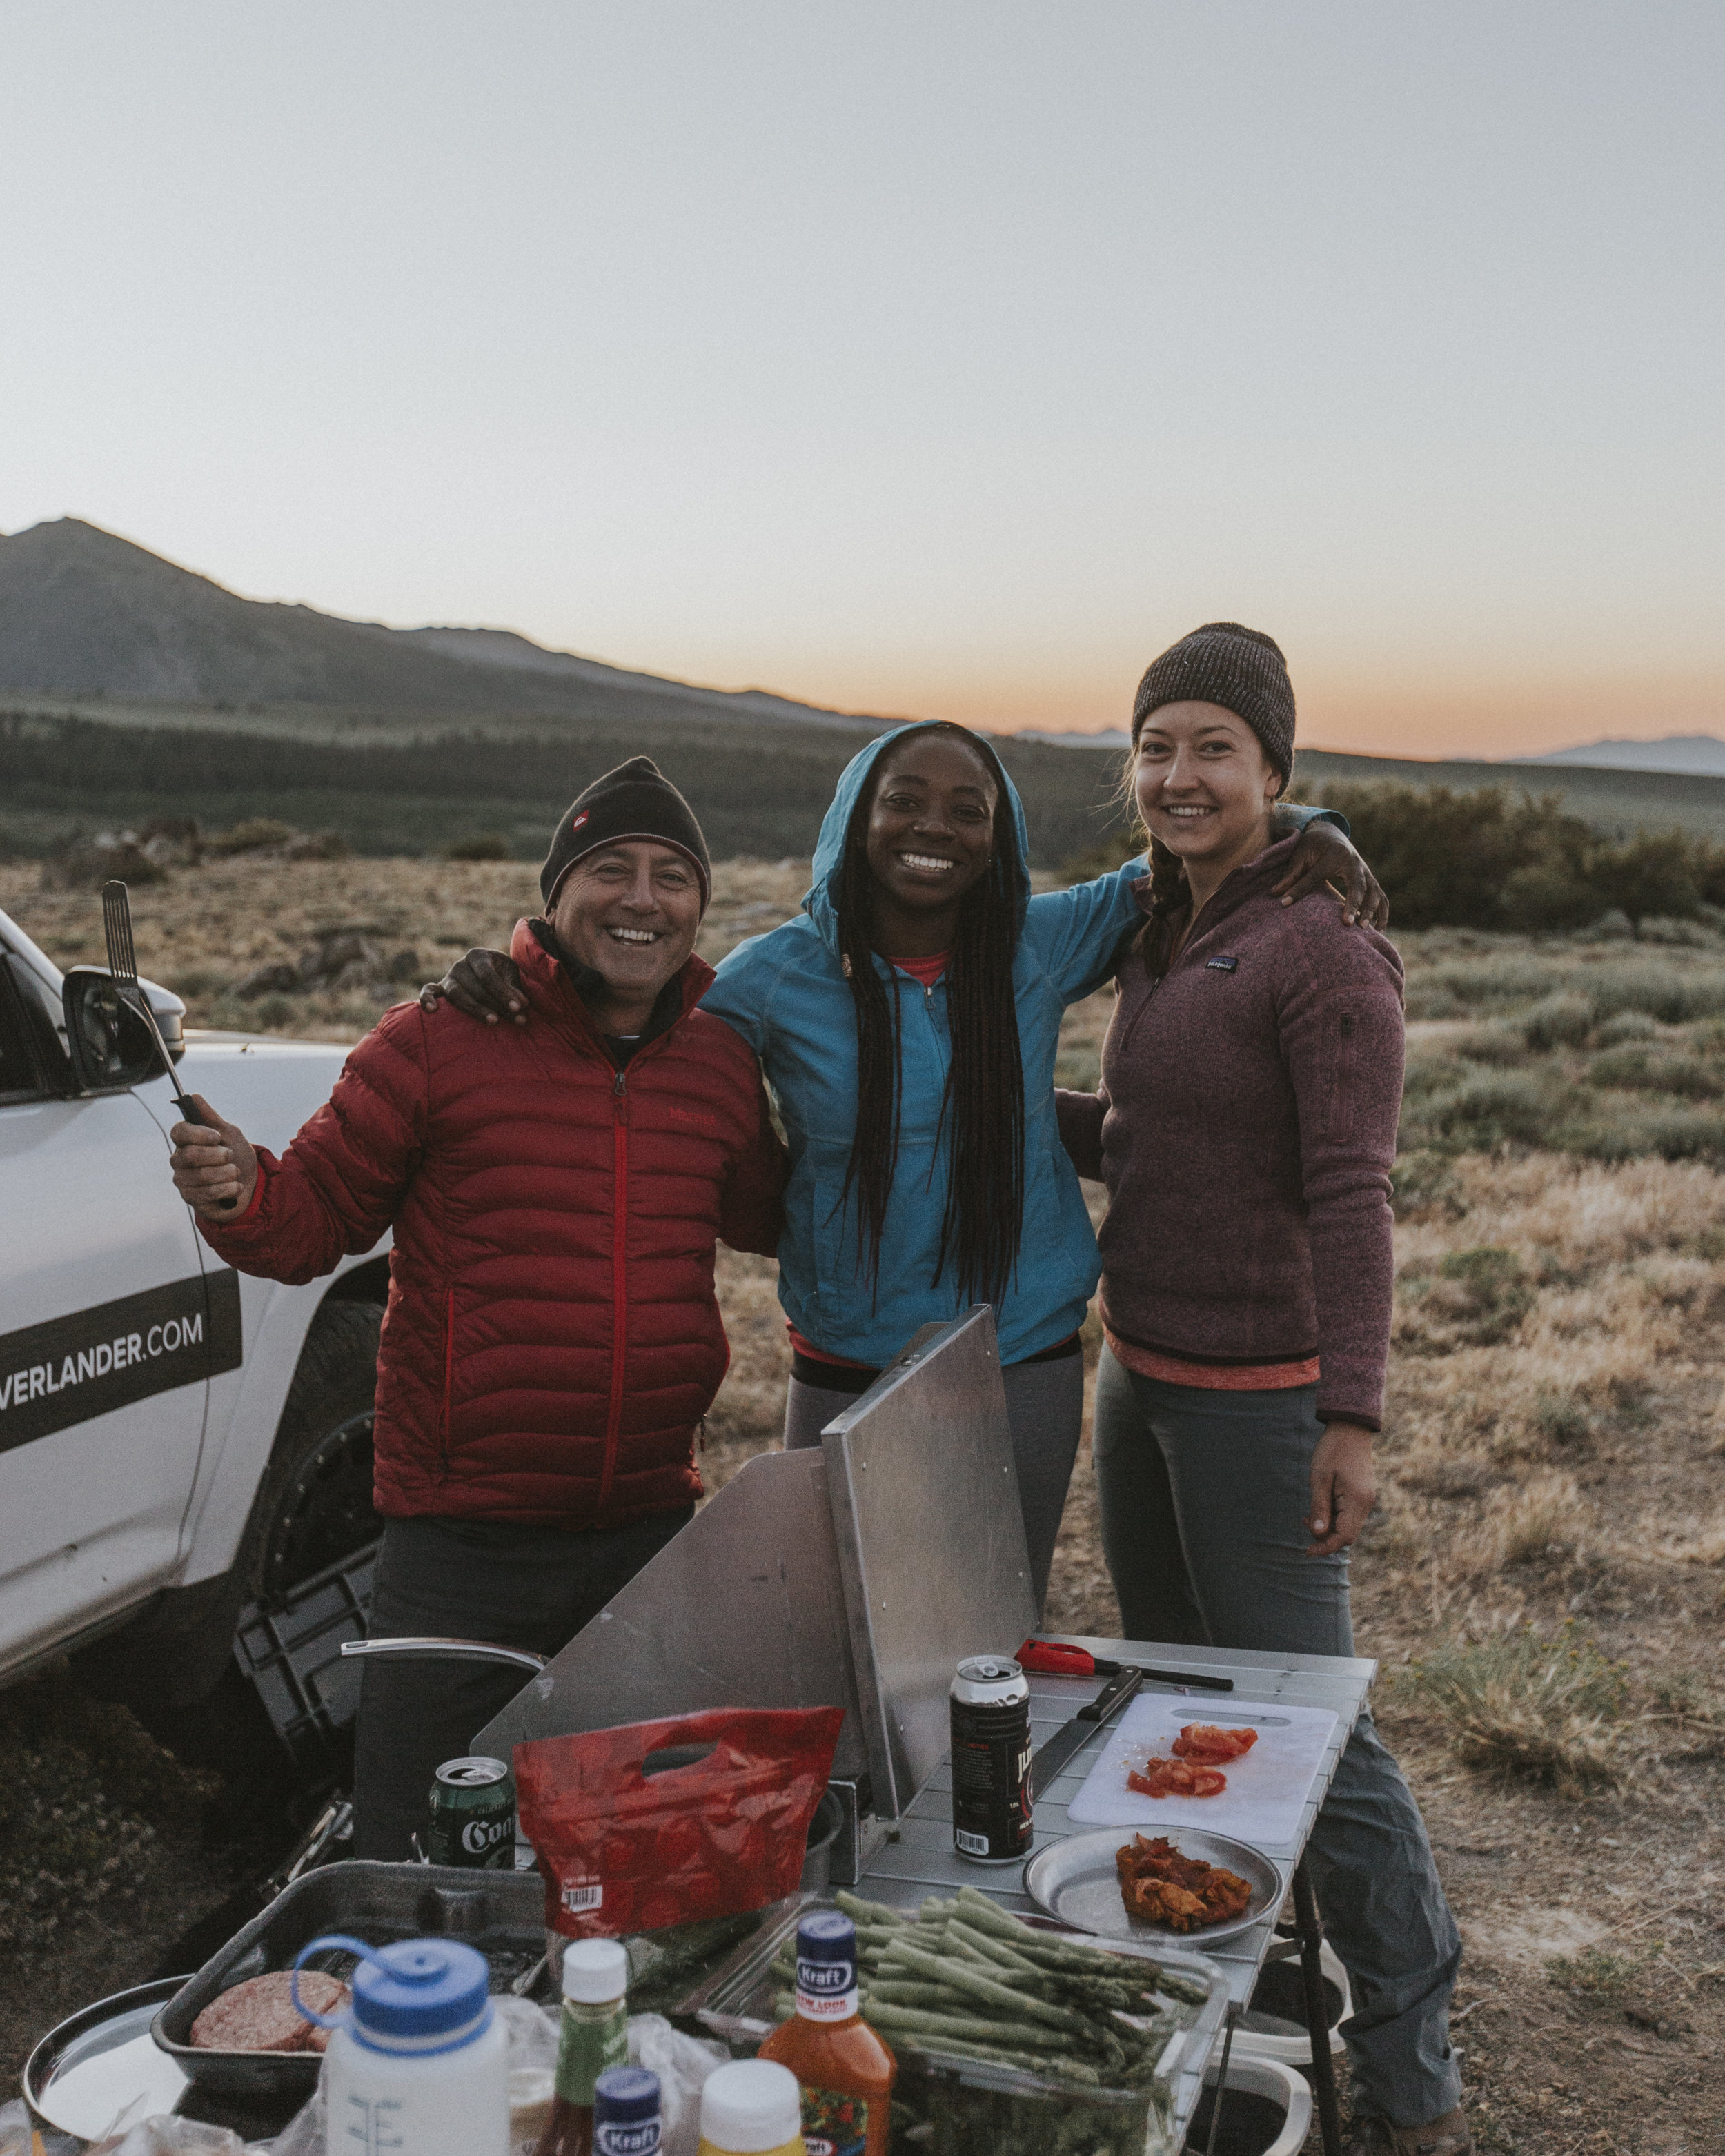 An Adventure in the Sierras